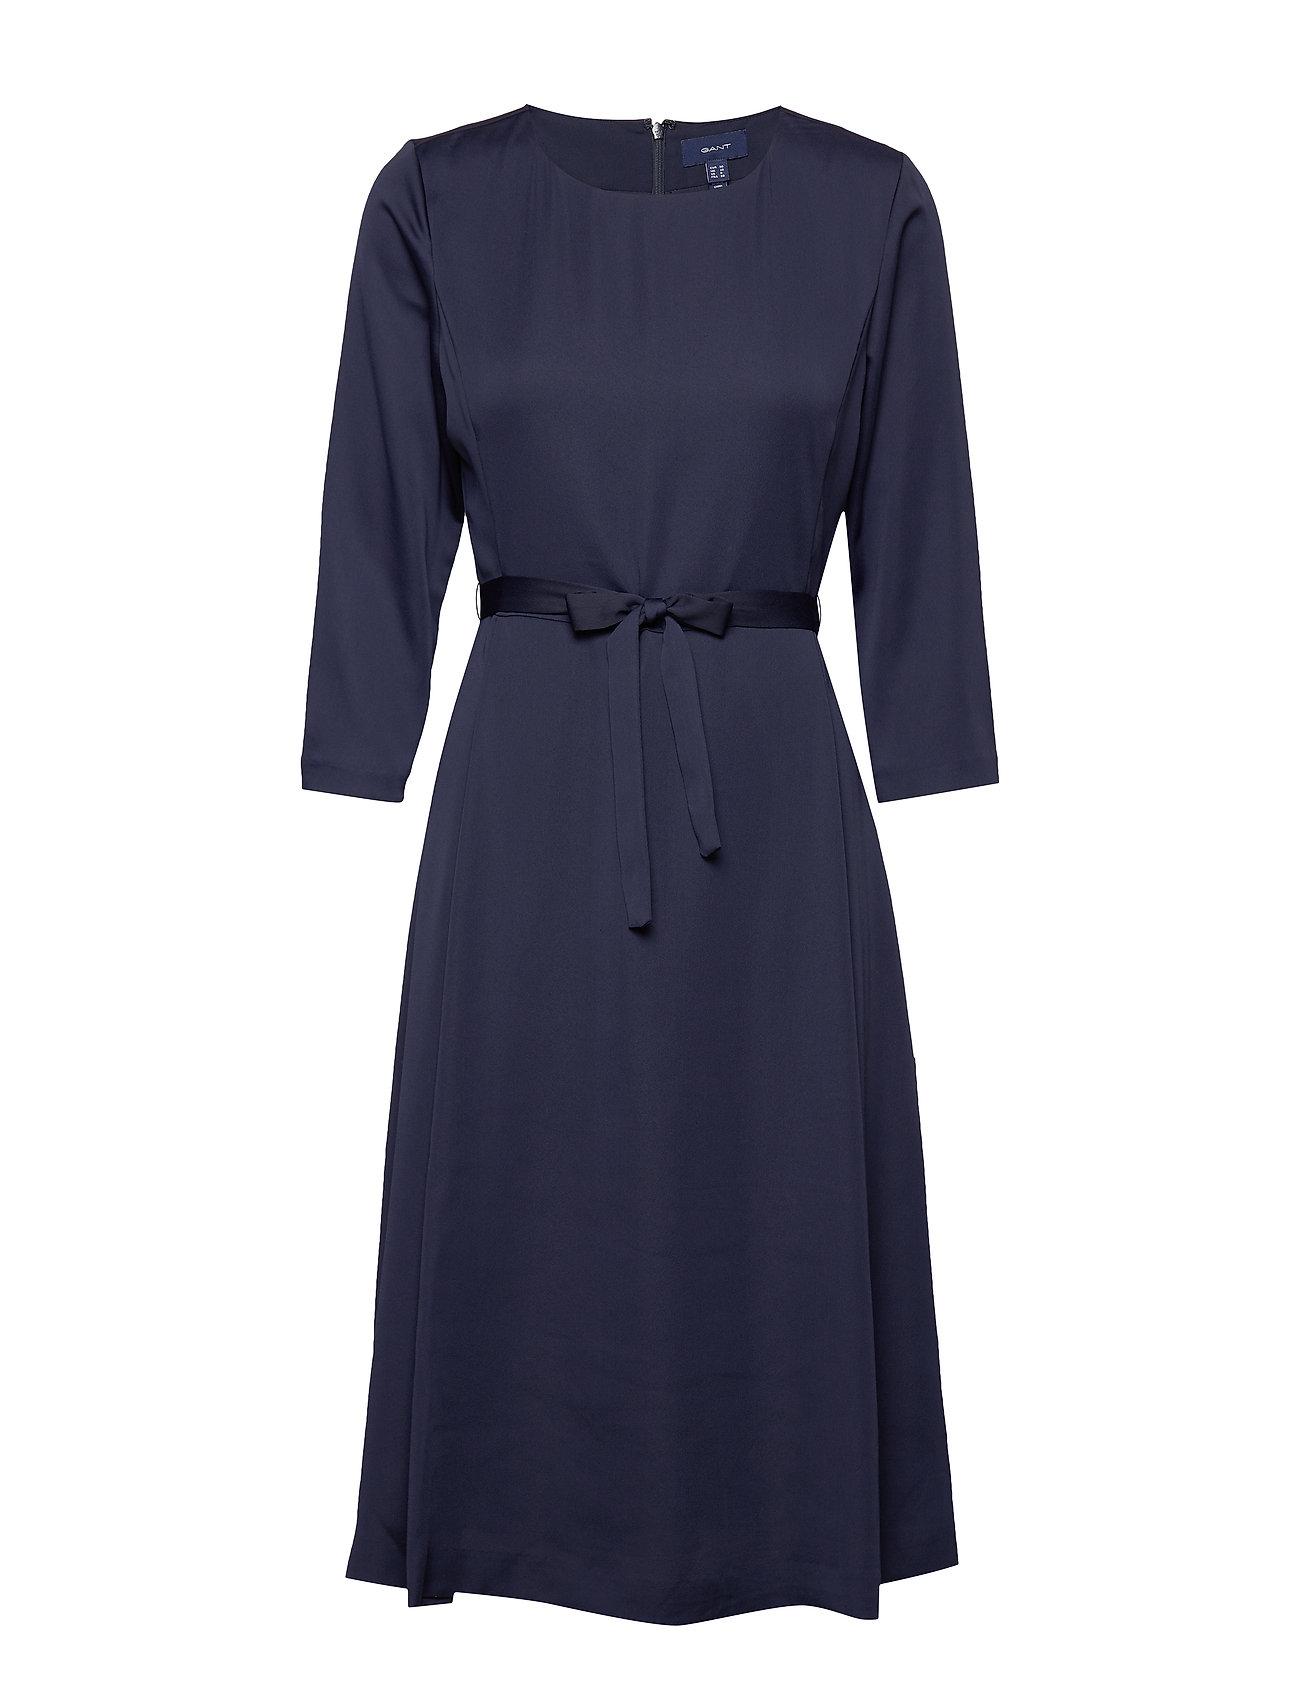 GANT D1. PREPPY STRIPE FLARED DRESS - EVENING BLUE